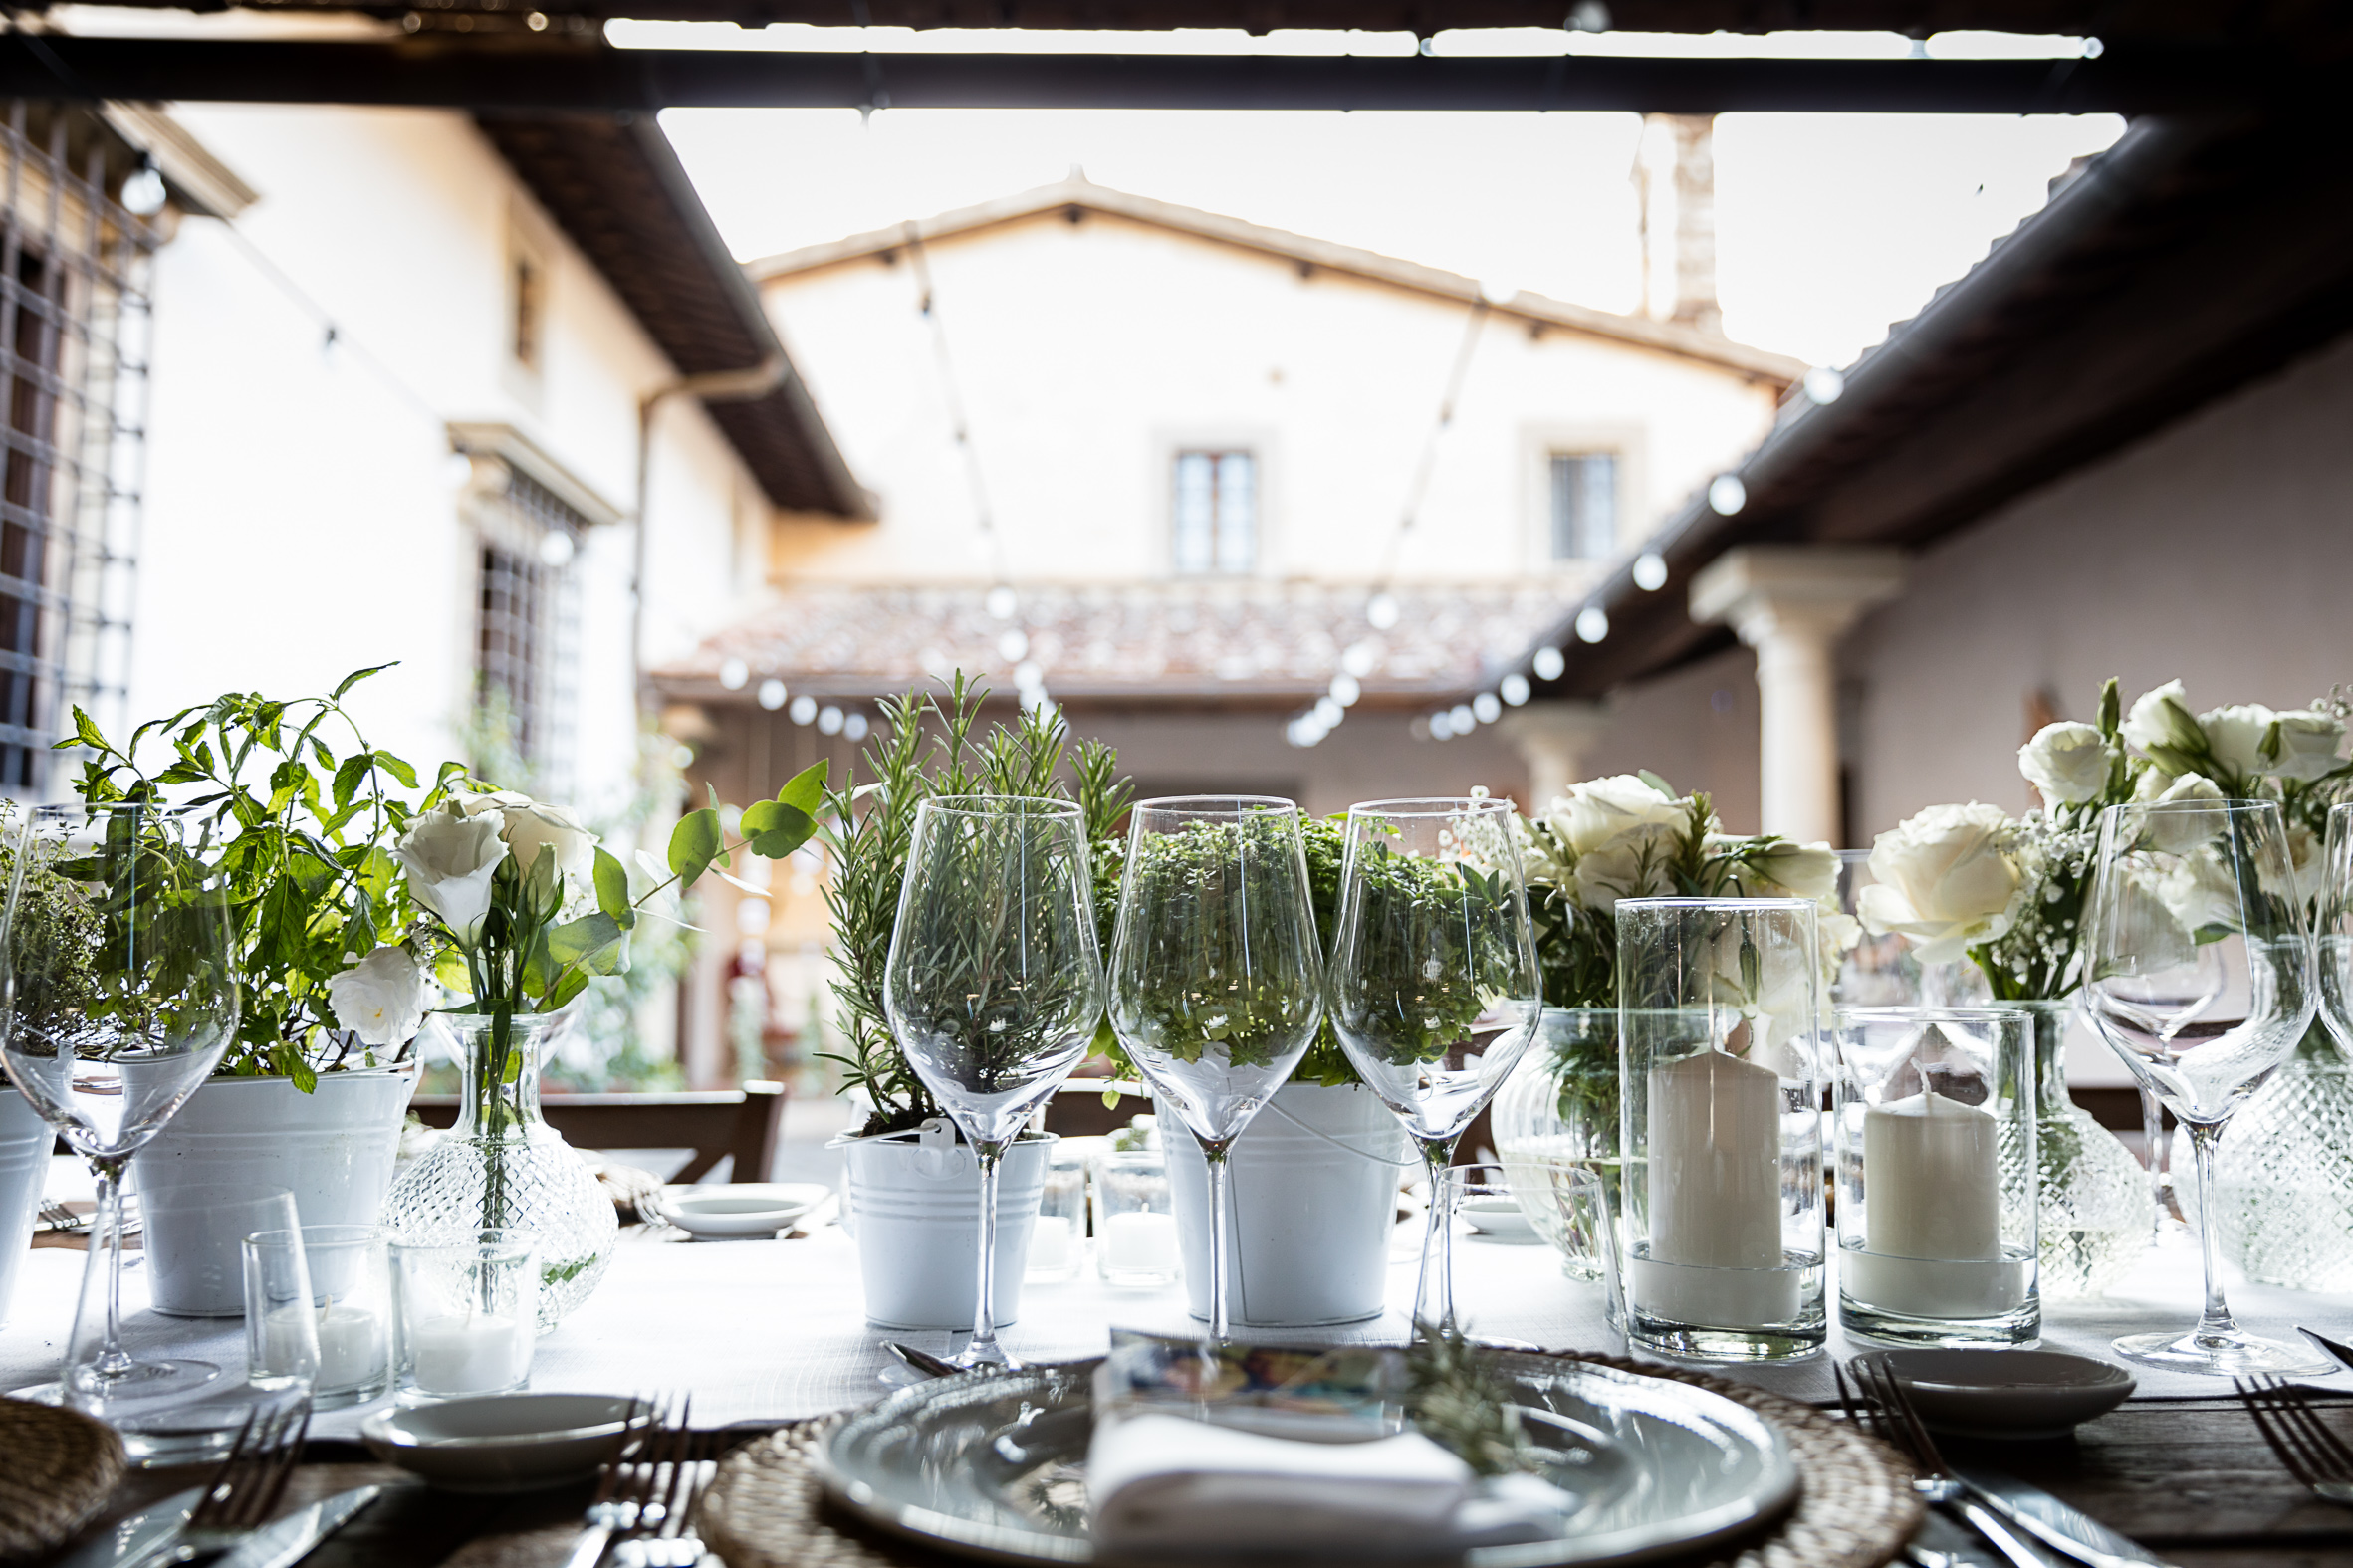 Hochzeit Andrea und Dario_Toskana 2017_171_a4.jpg